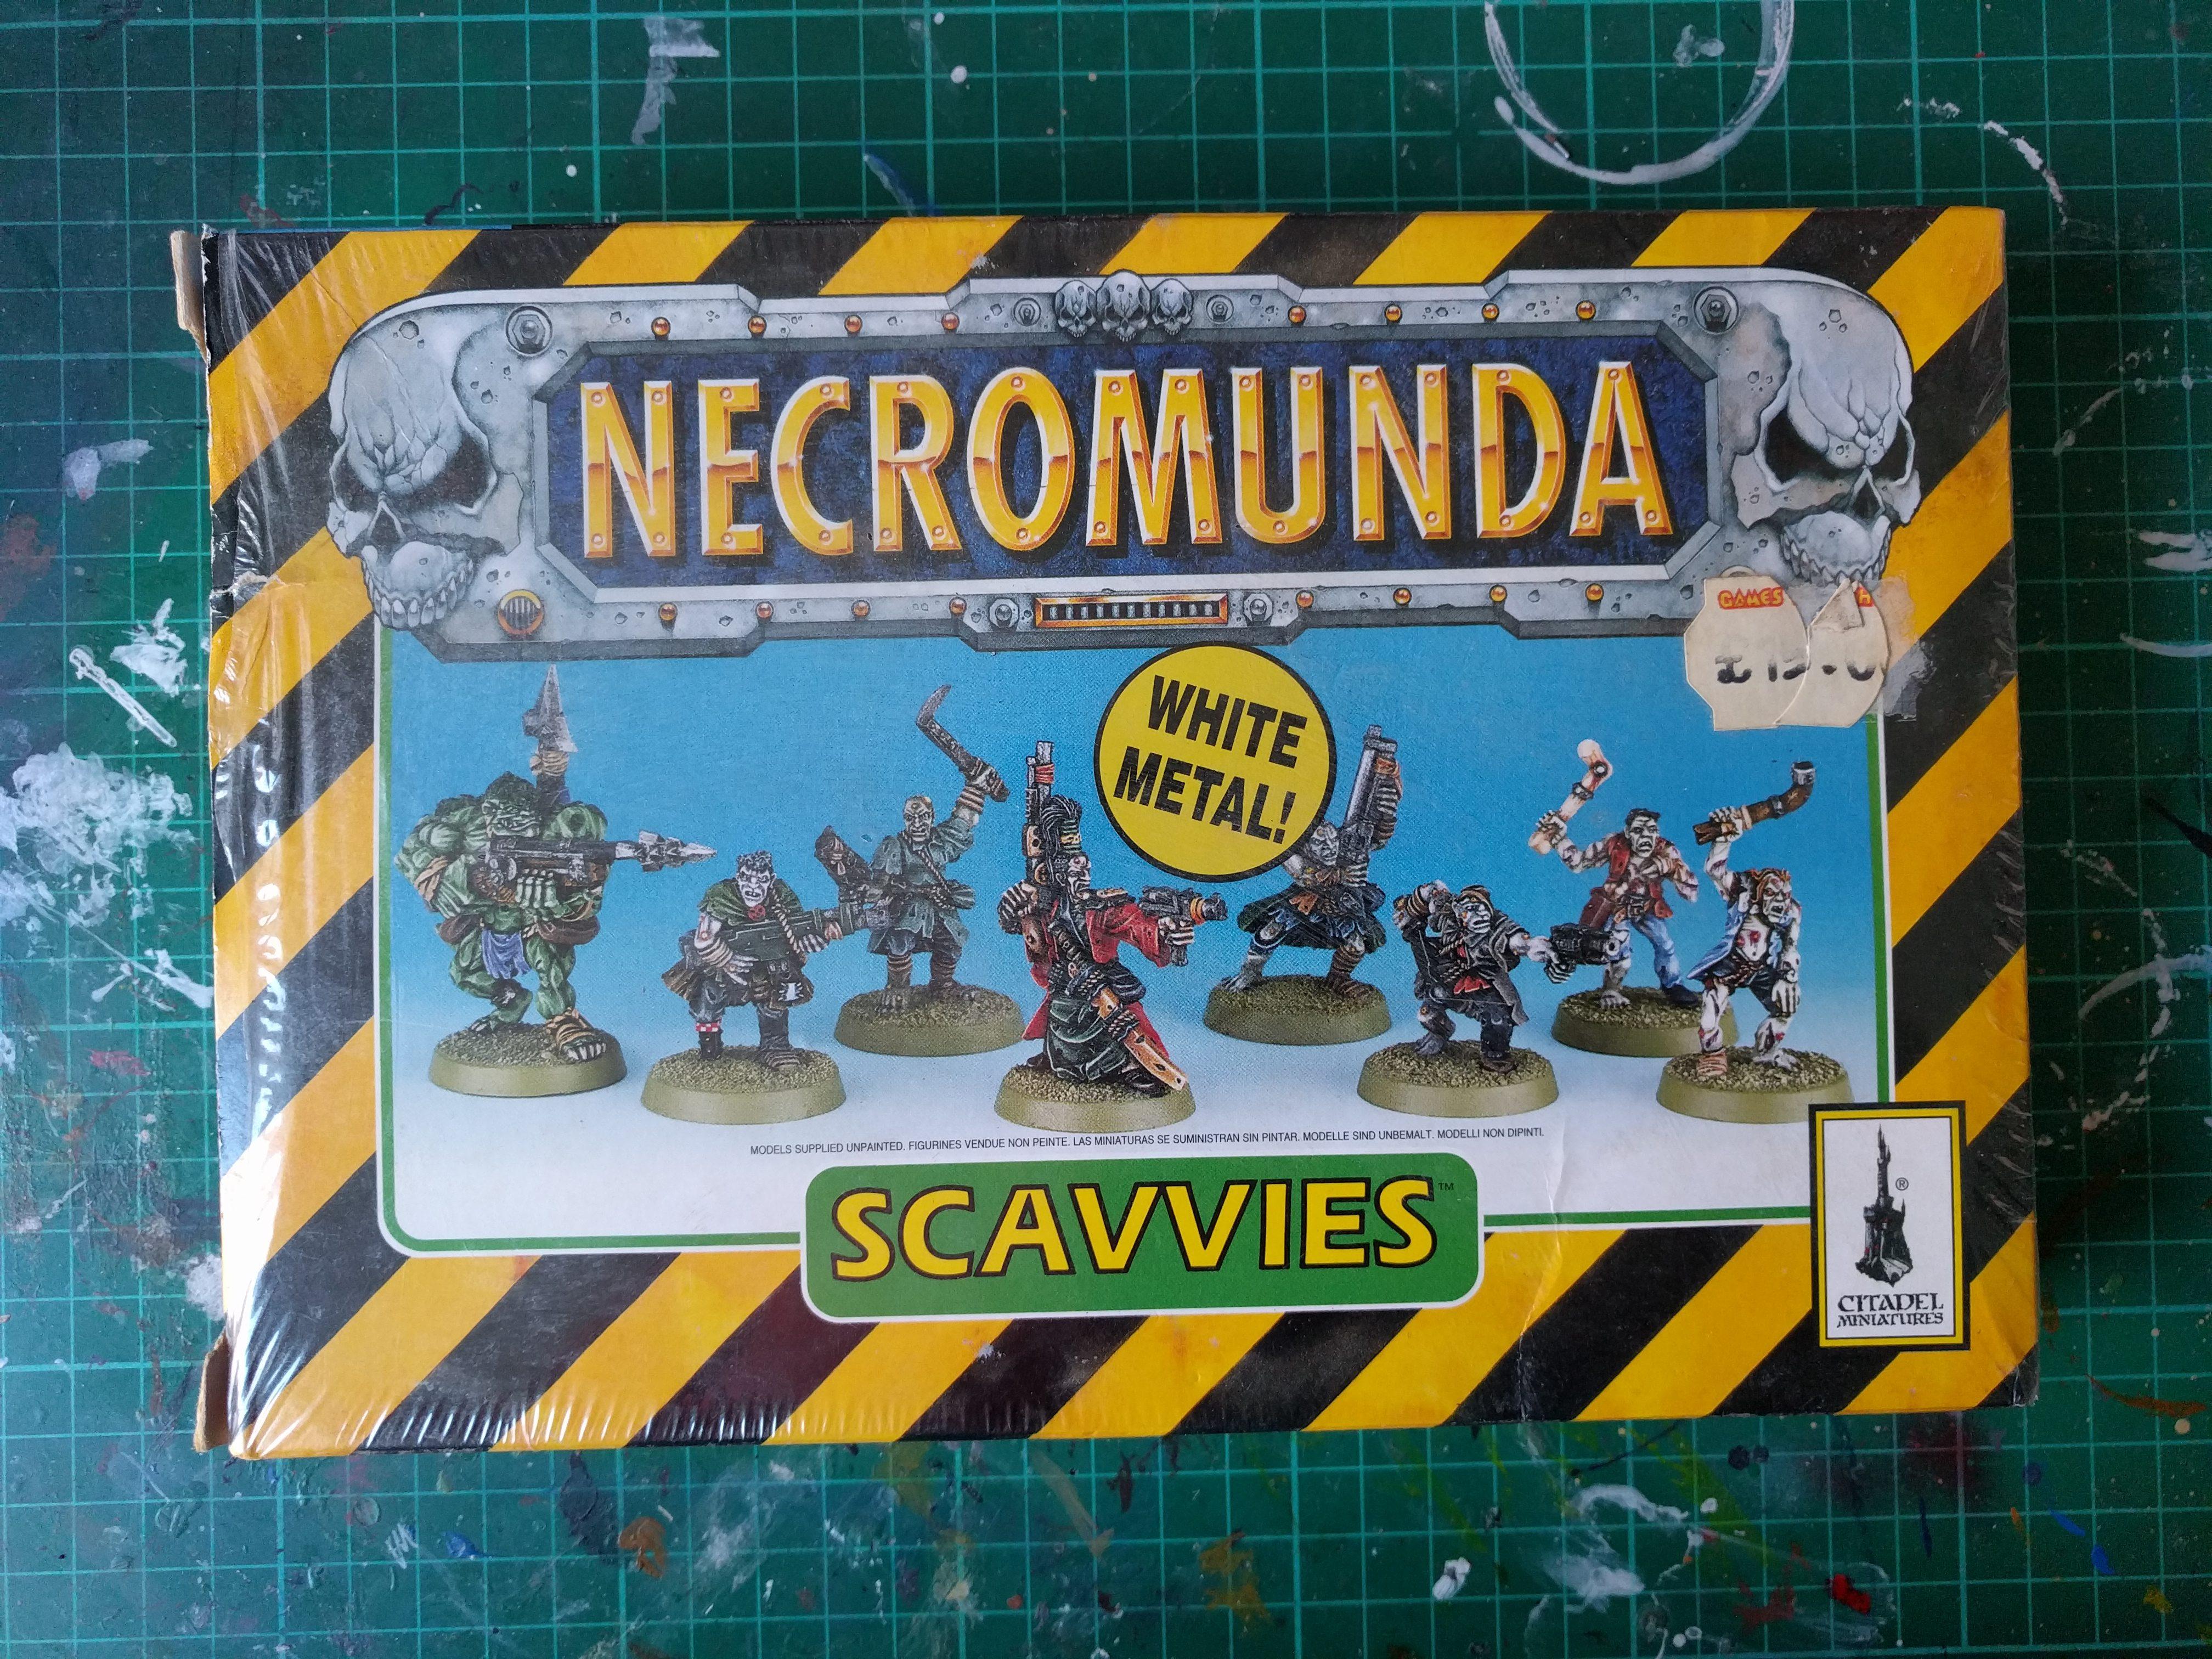 Necromunda Scavvies